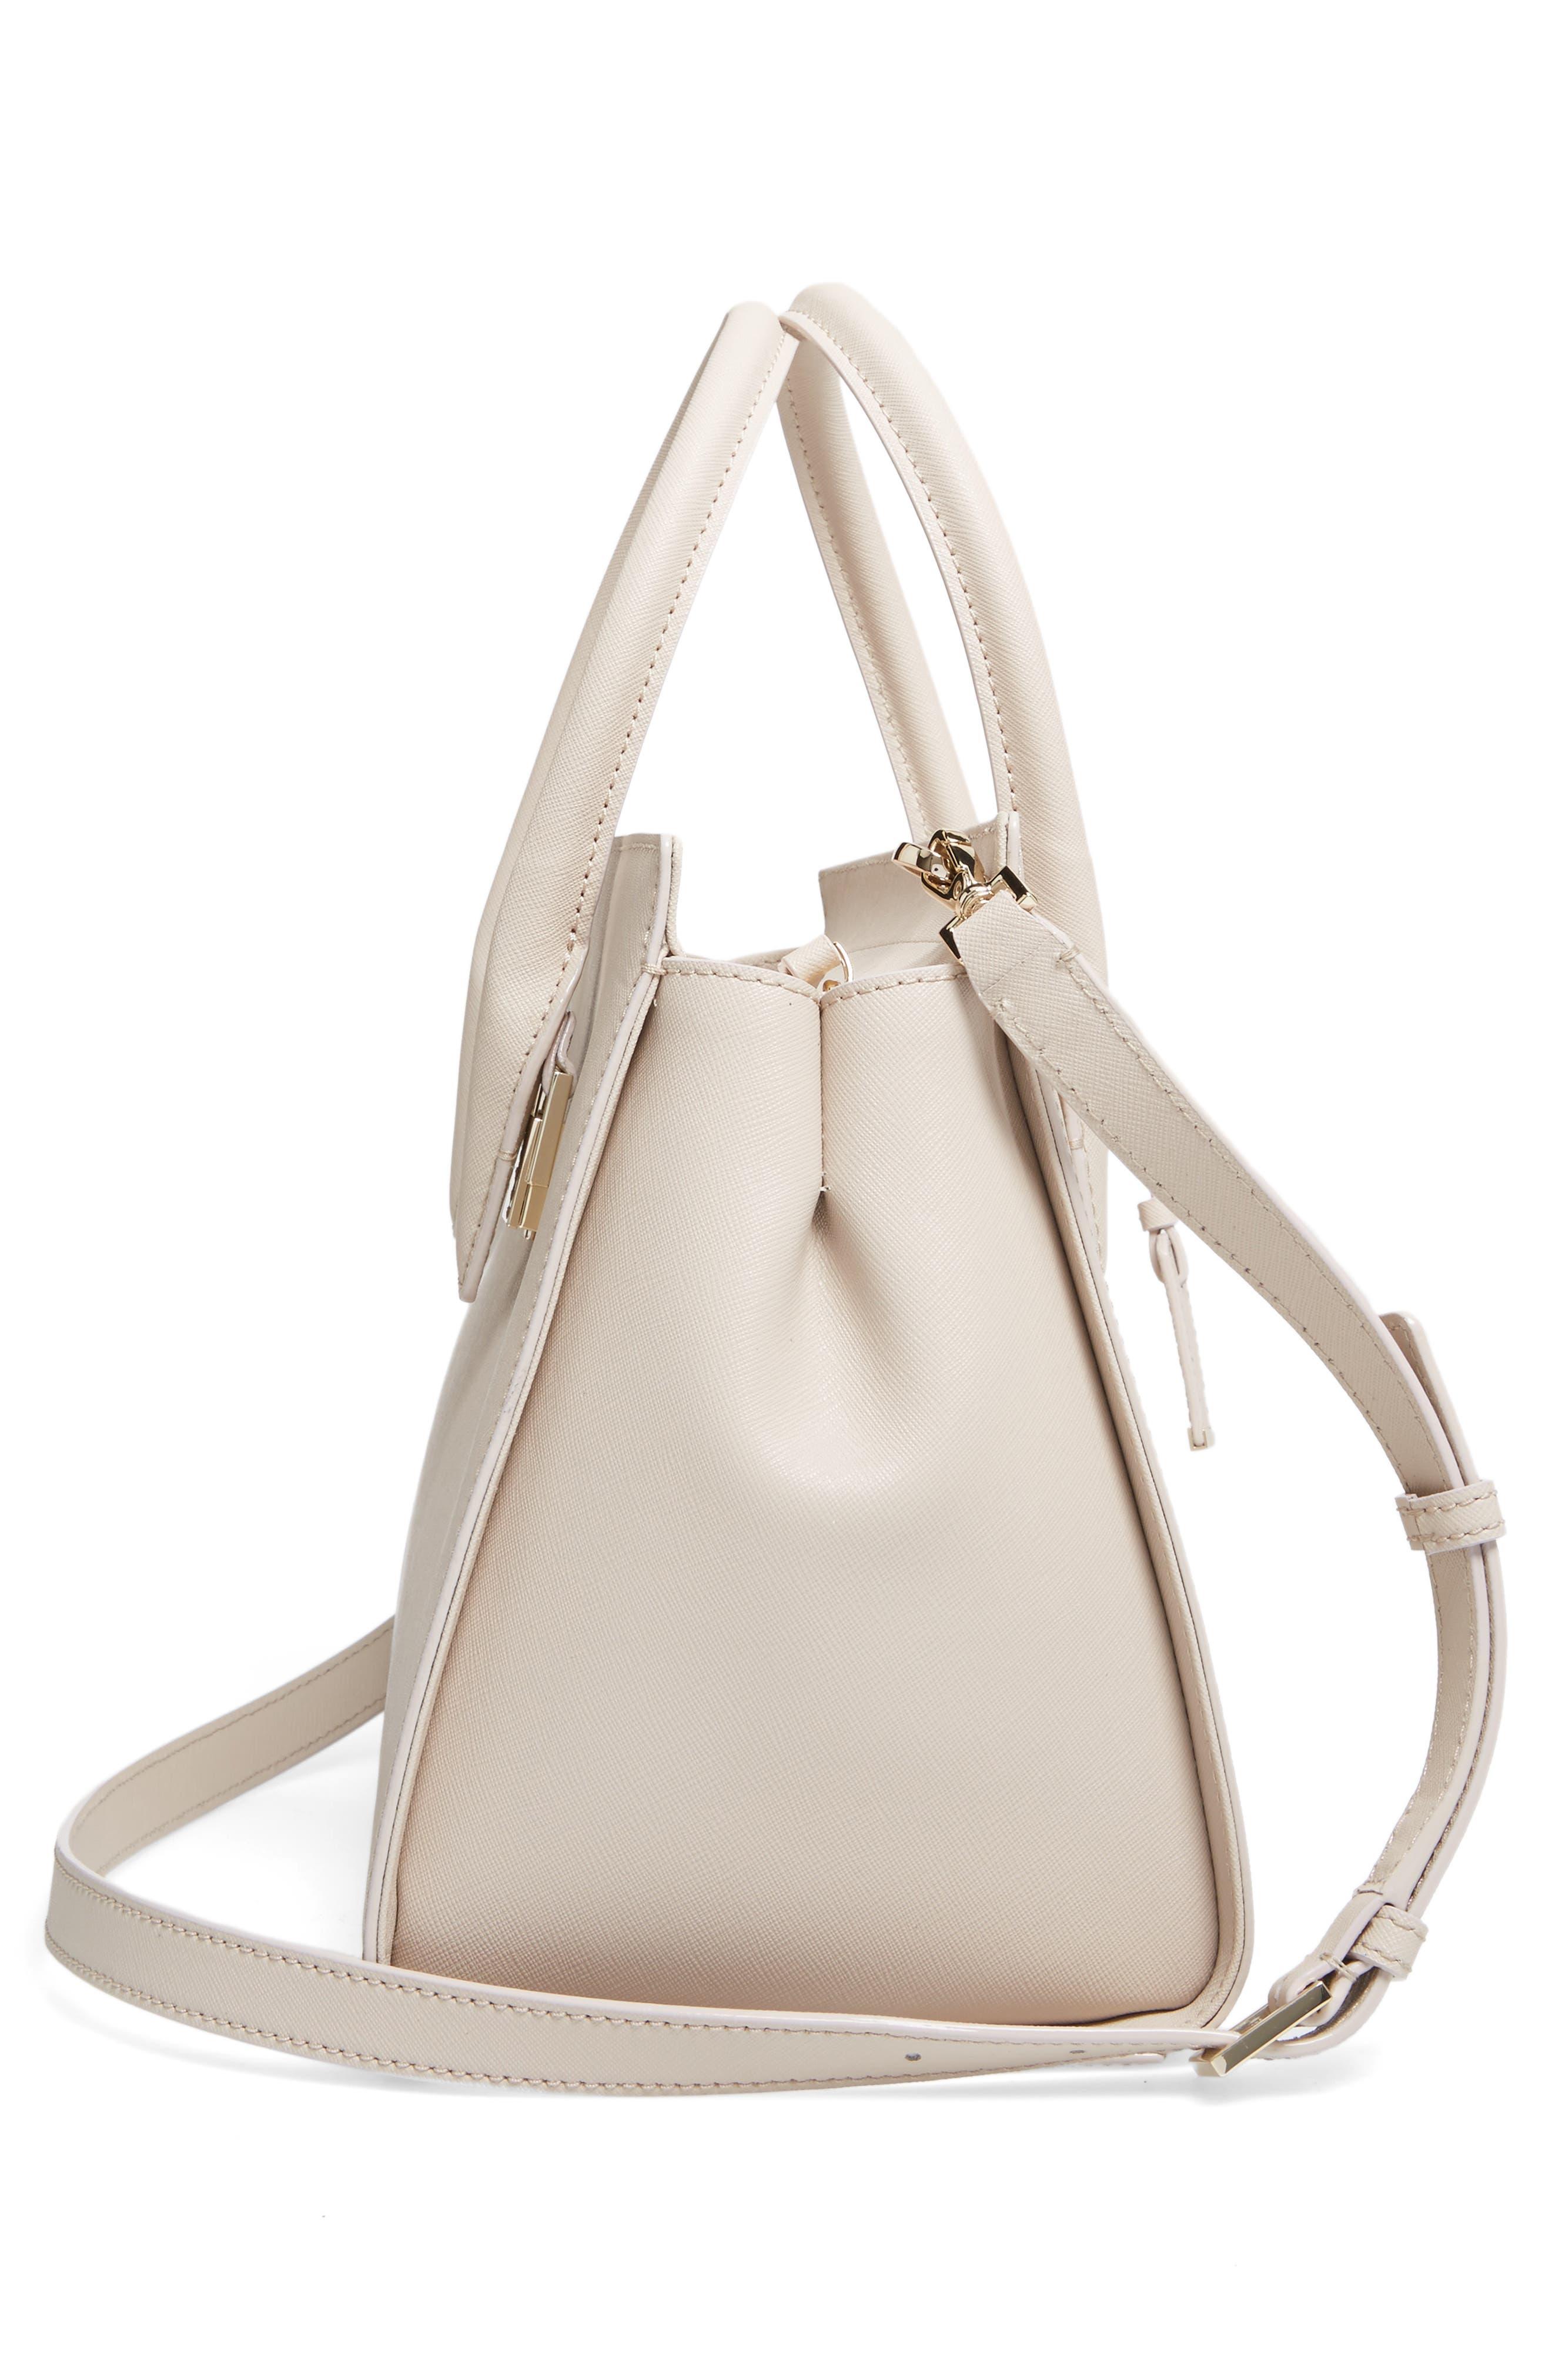 make it mine - candace leather satchel,                             Alternate thumbnail 10, color,